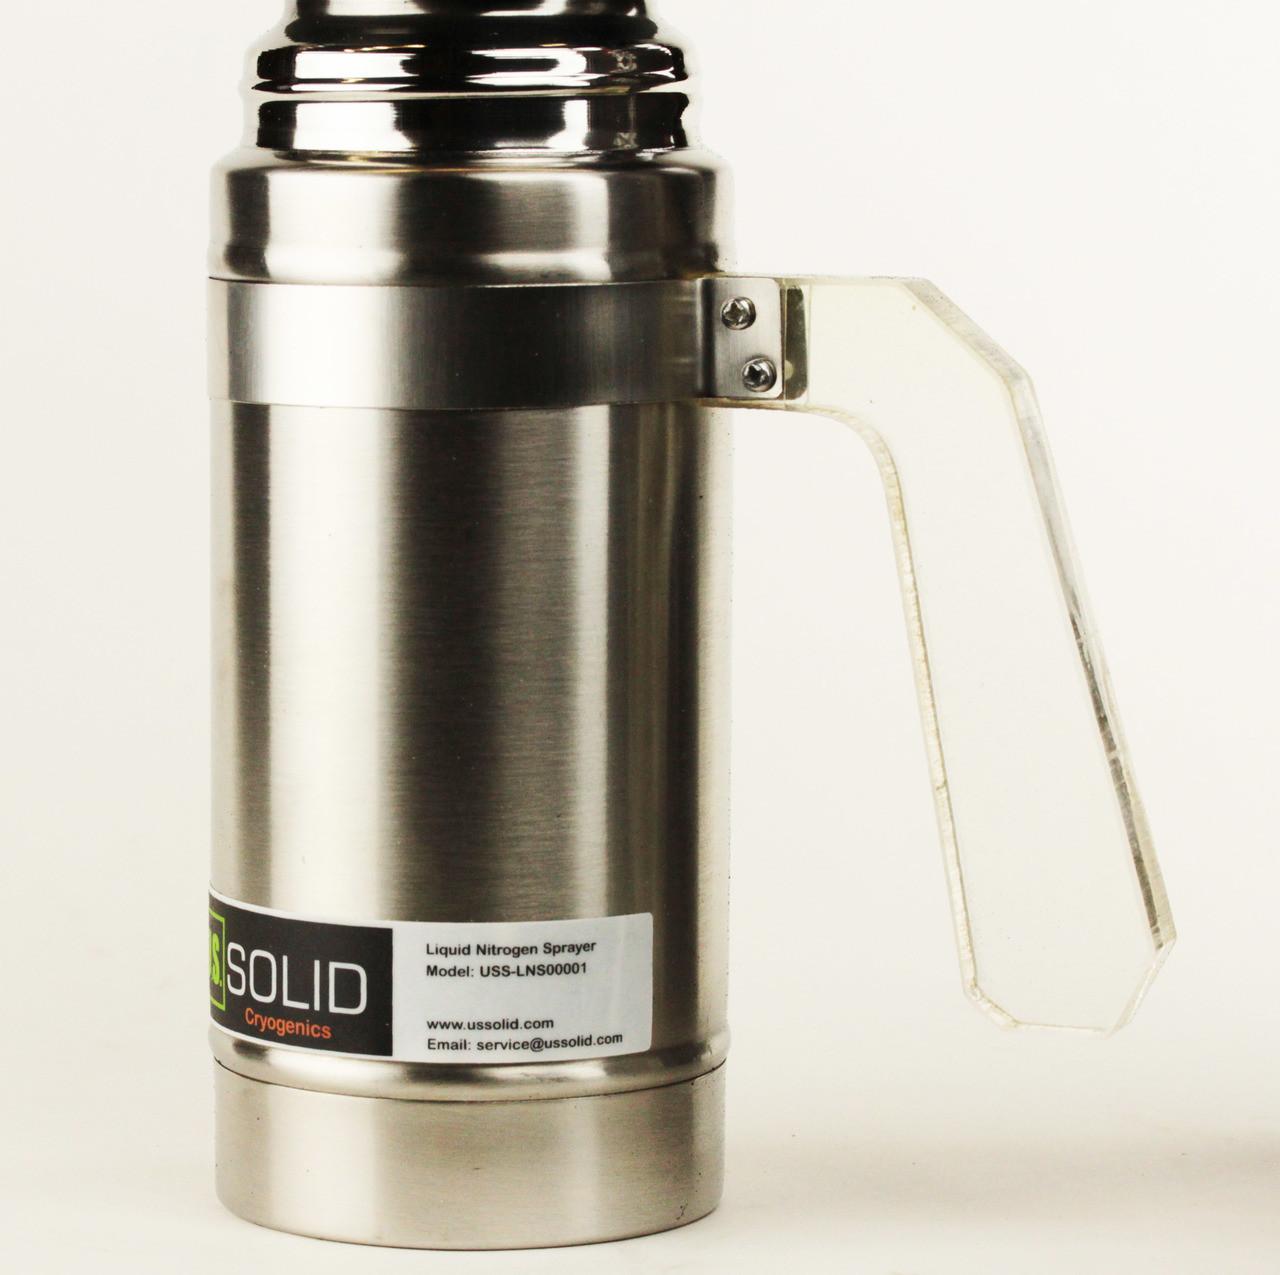 Liquid Nitrogen(LN2) Sprayer Freeze Treatment Instrument Unit 500ml (16oz.)